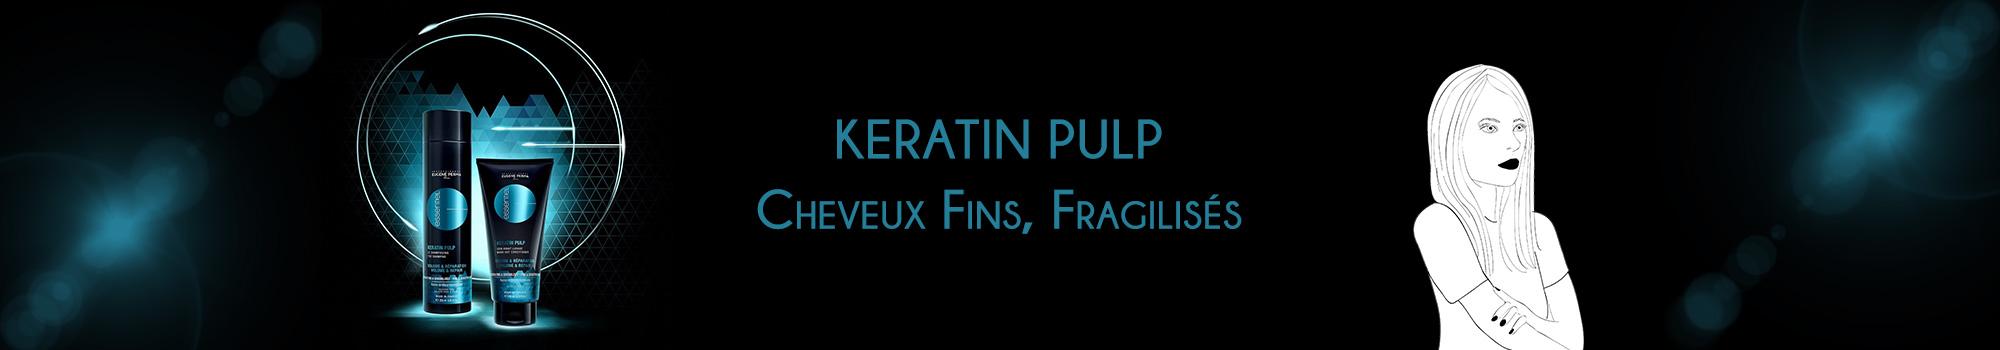 Keratin Pulp Eugène Perma